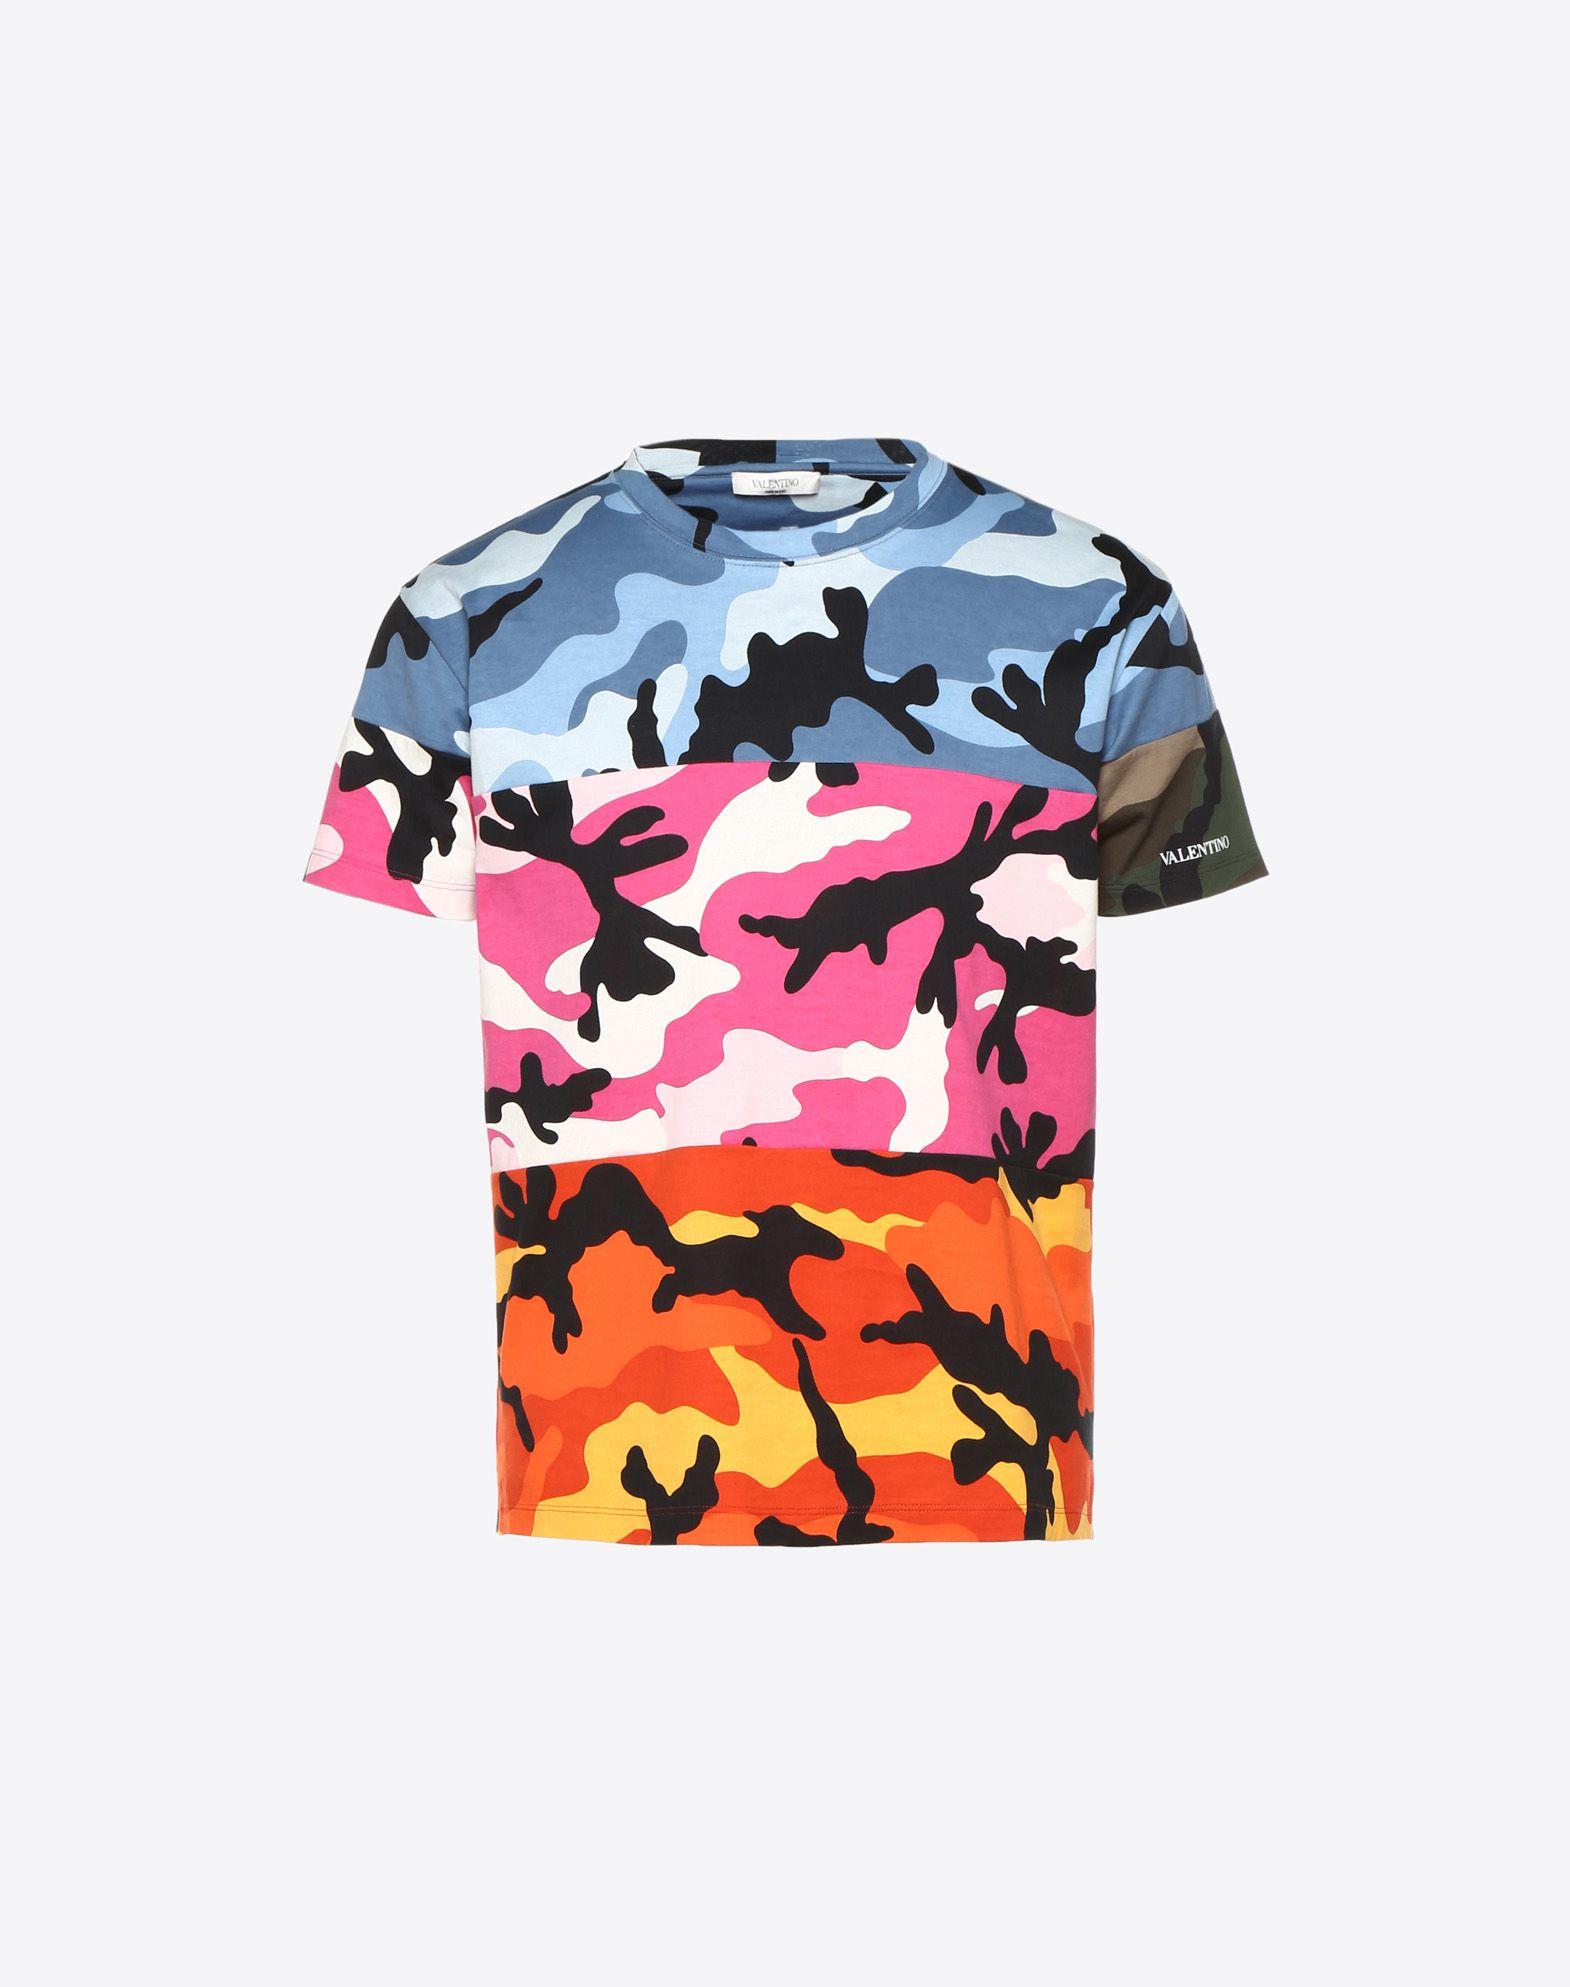 VALENTINO Logotipo Punto jersey Estampado militar Cuello redondo Bajo con aberturas laterales Manga corta  12177573ww